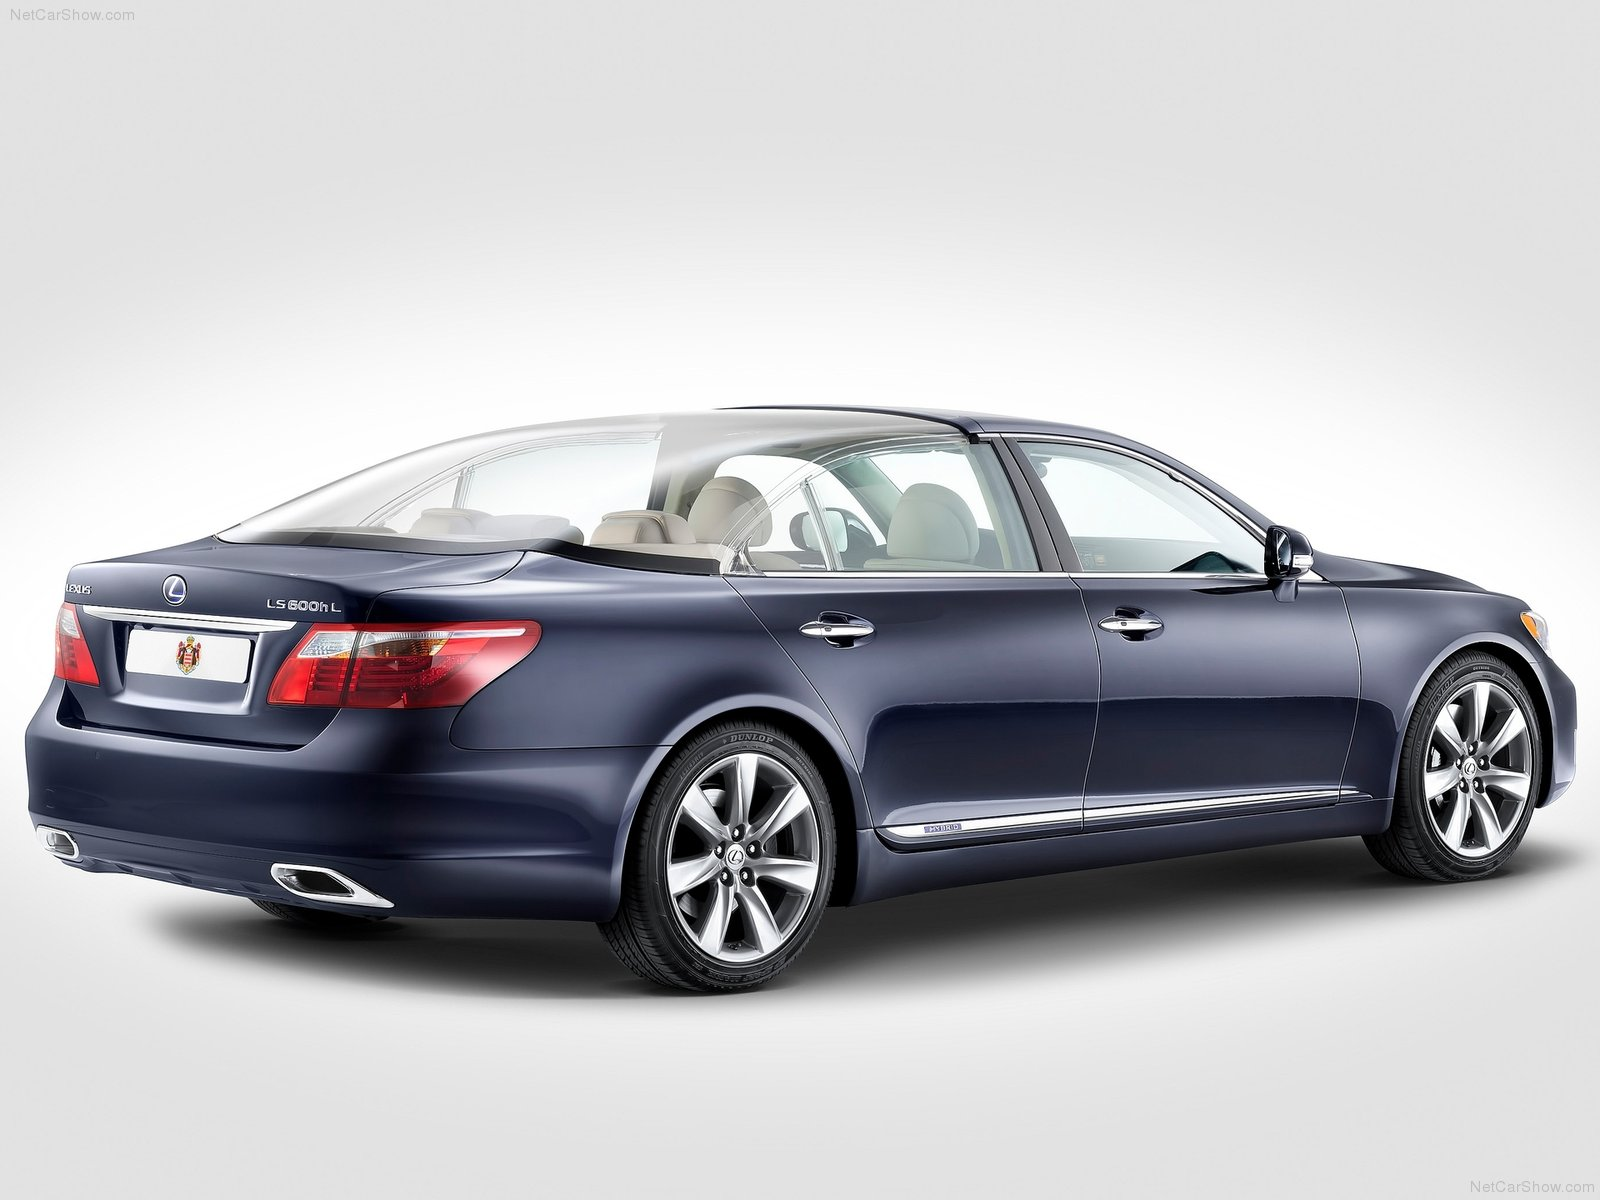 Car 4 Driversشرکت لکسوس برای اینکه ایمنی یک اتومبیل با سقف شیشه ای را در حد مدل استاندارد نگه دارد از کمک یک شرکت فرانسوی تولید لوازم هوا فضا استفاده کرده.